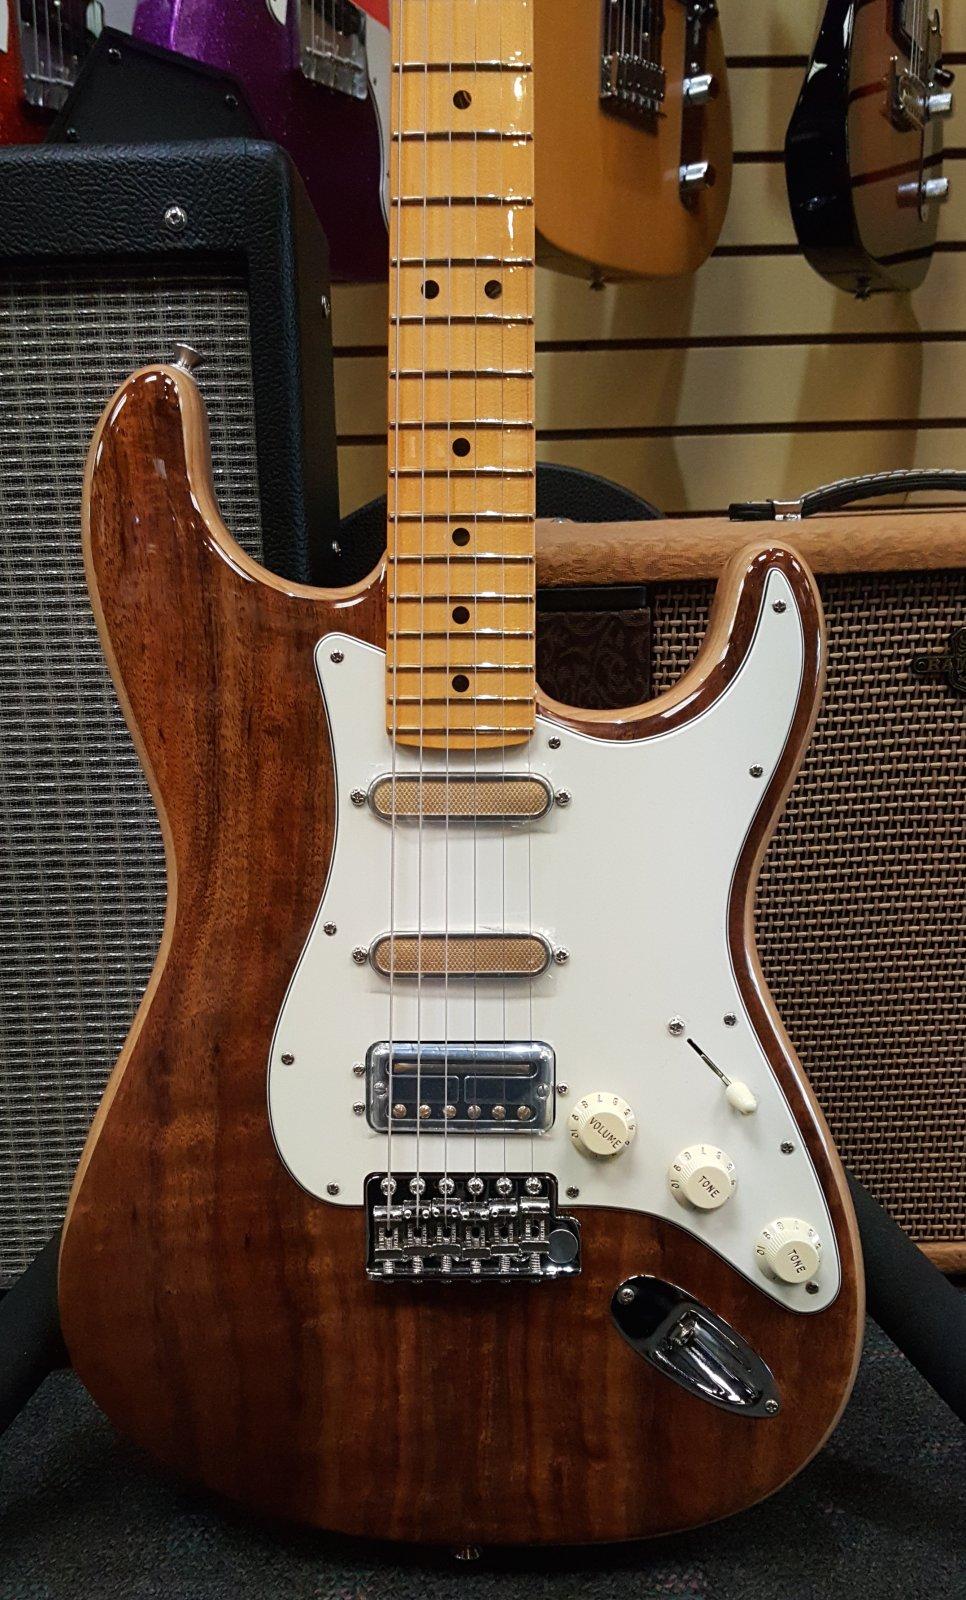 Fender Rarities Flame Koa Top Stratocaster, Maple Neck, Natural